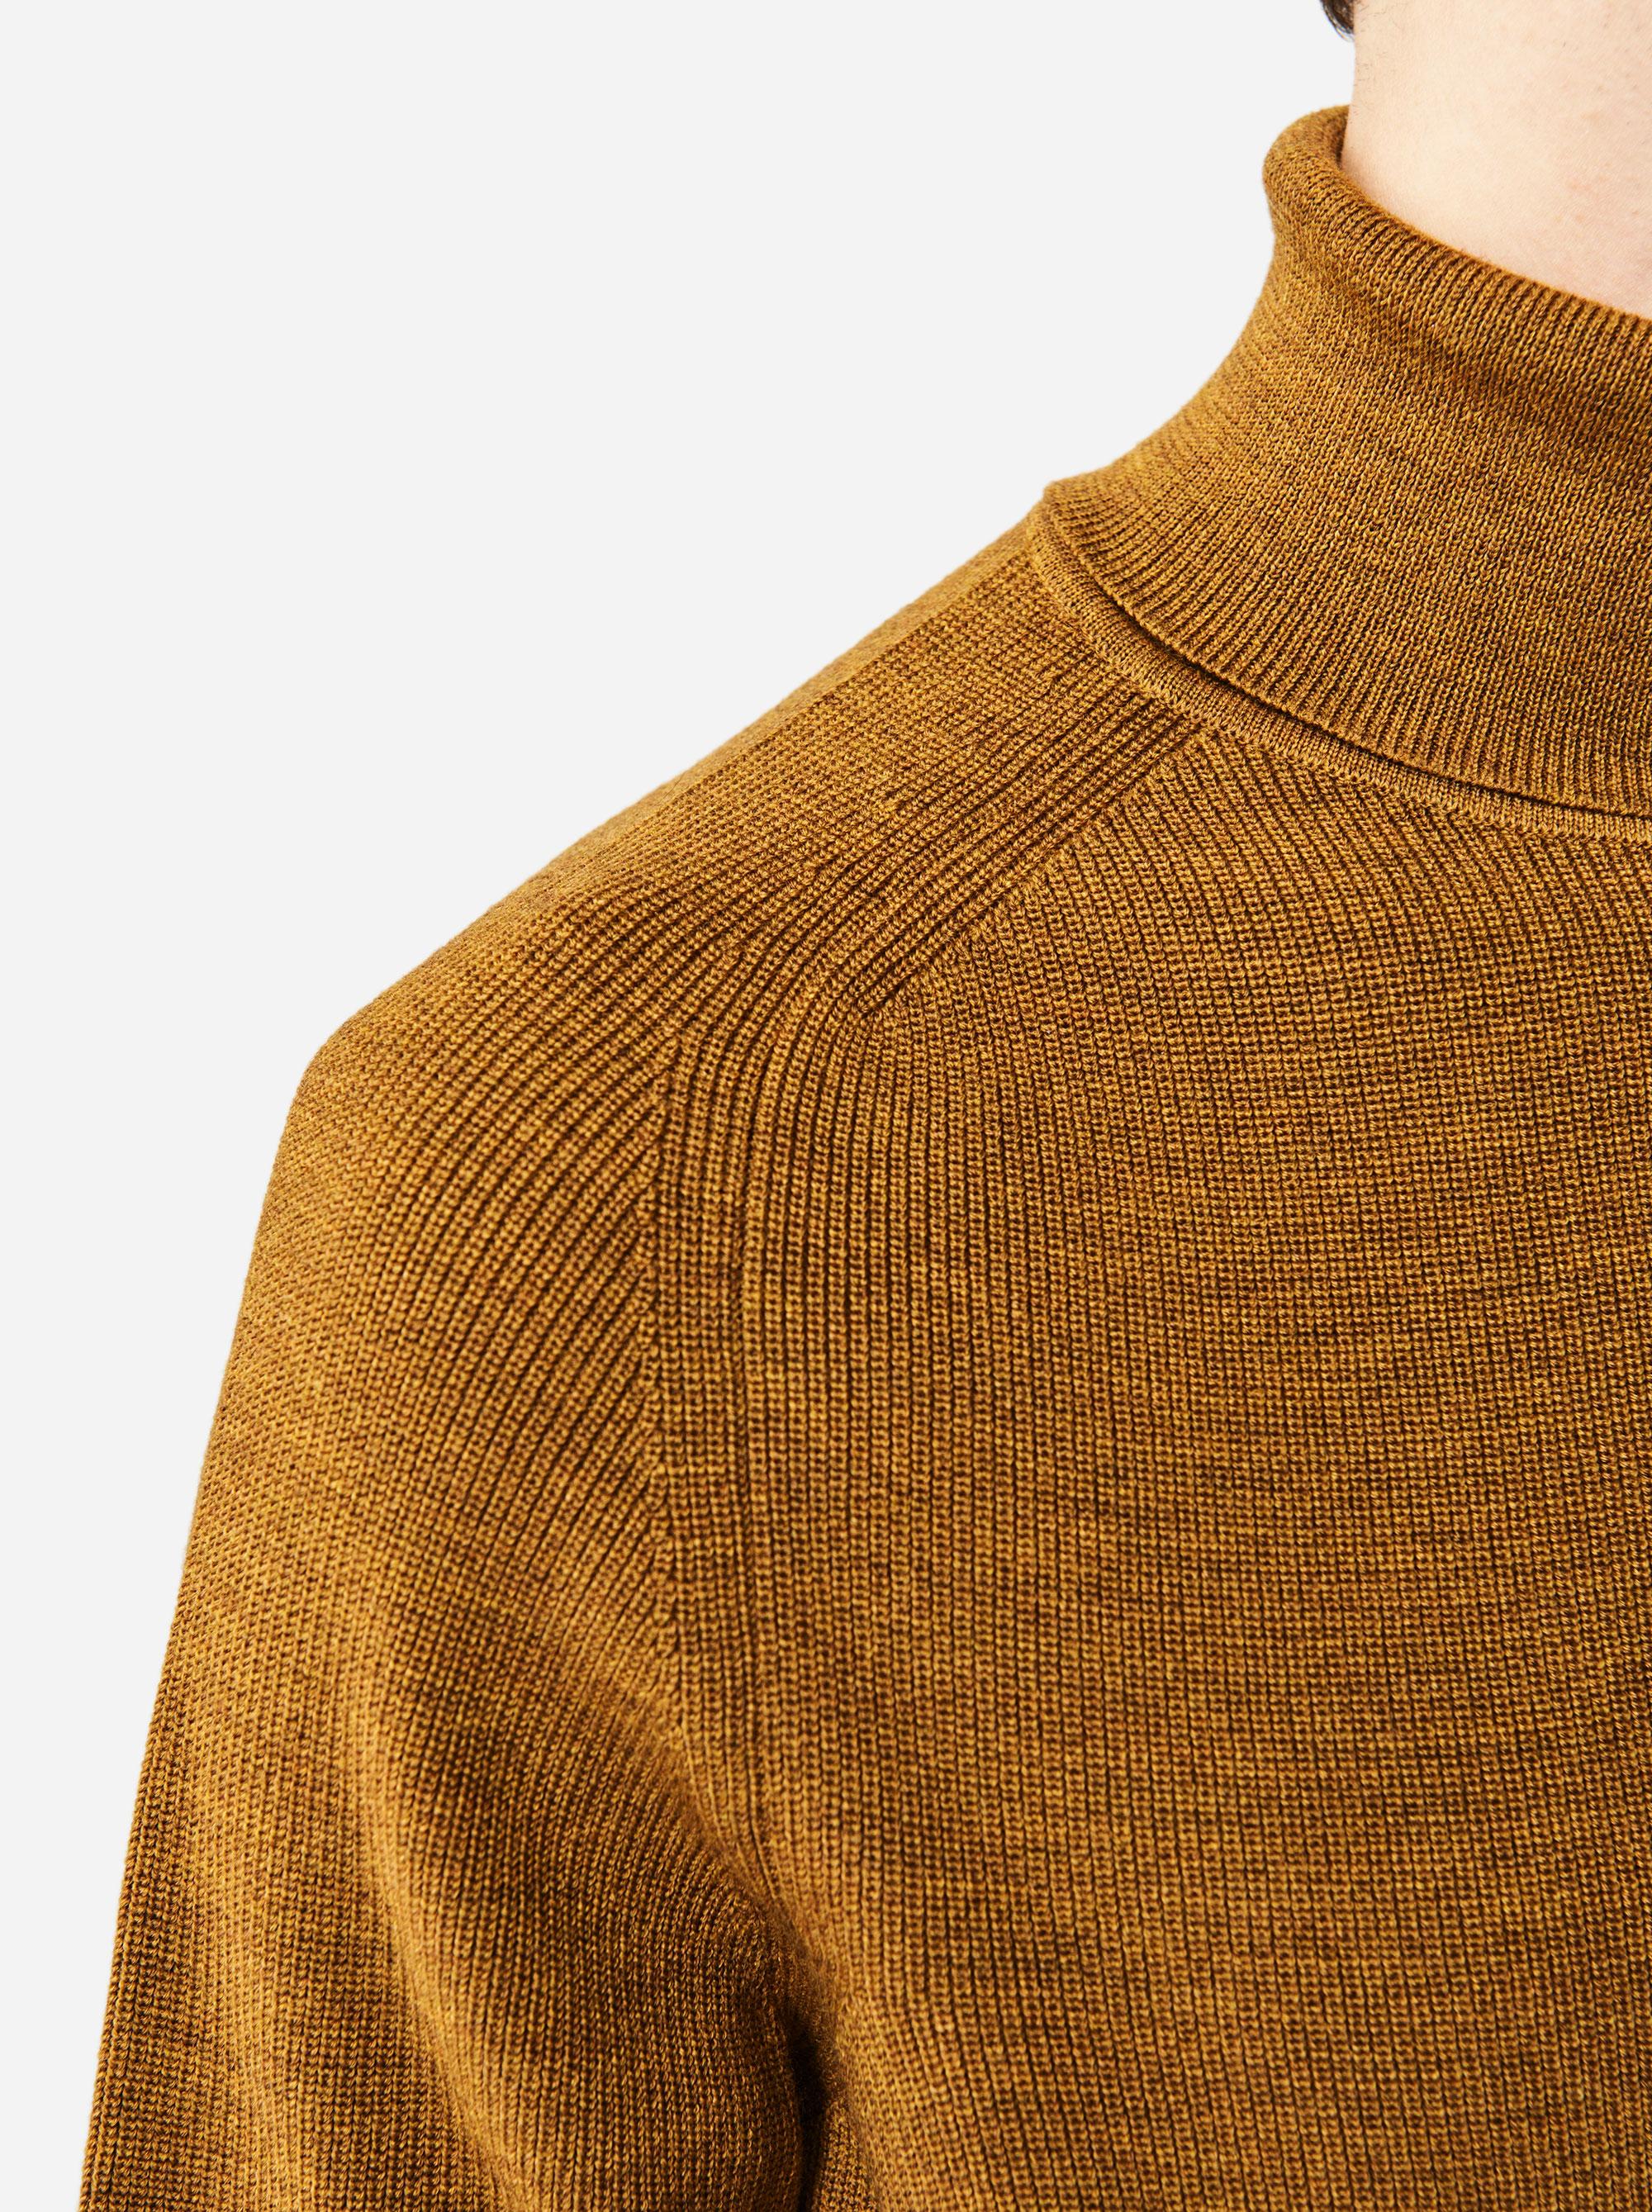 Teym - Turtleneck - The Merino Sweater - Men - Mustard - 3